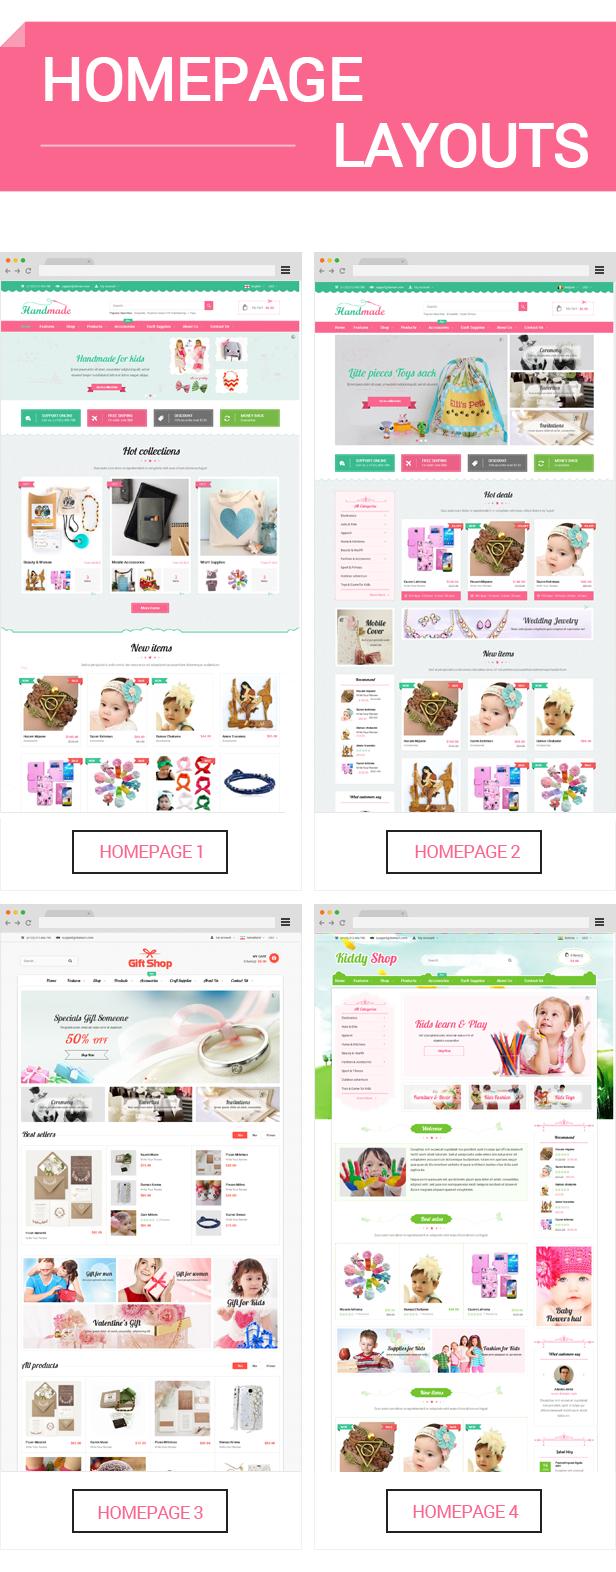 Handmade - Homepage